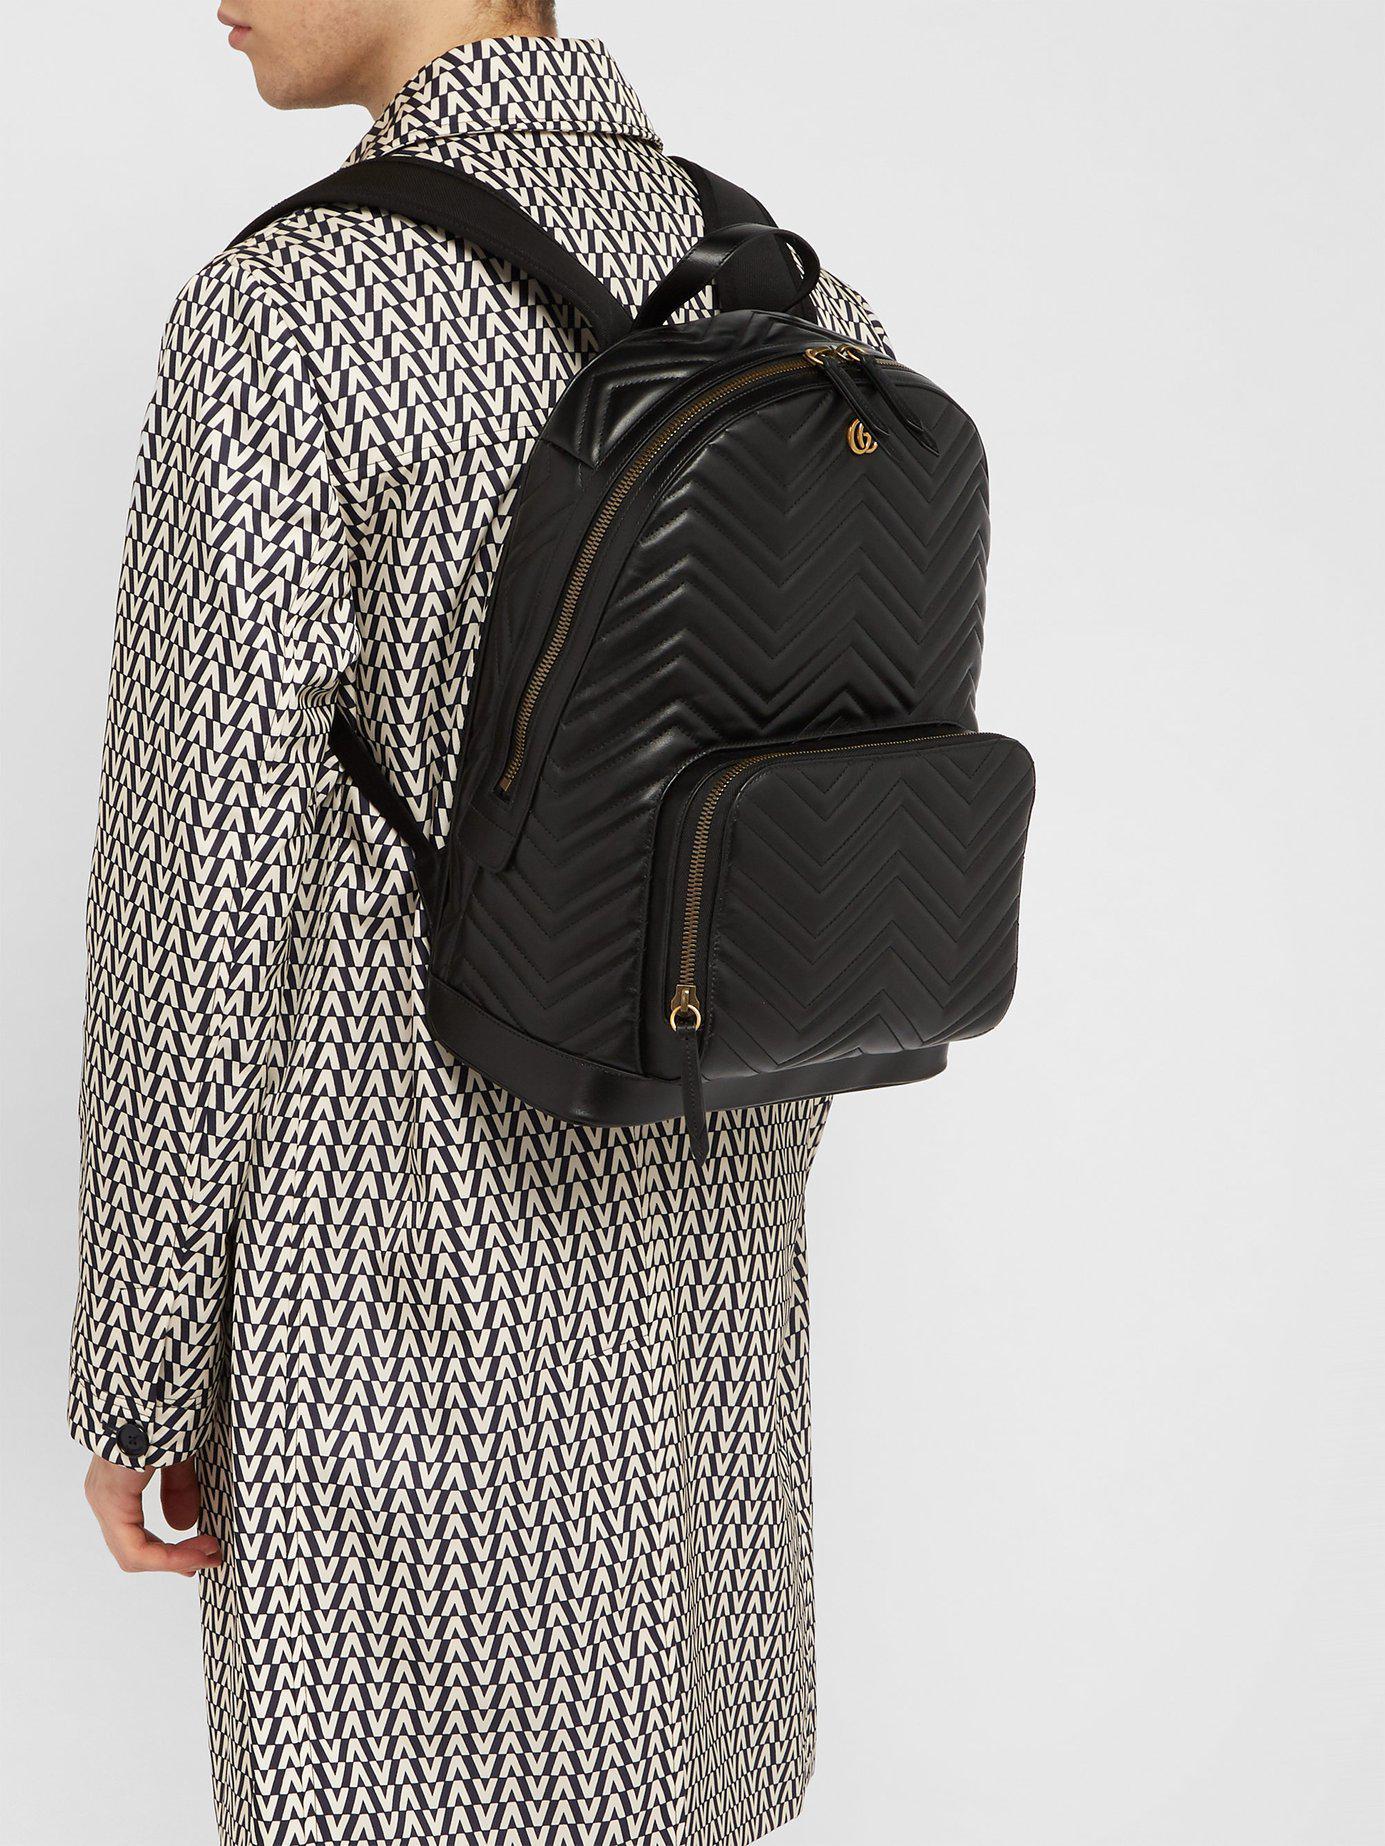 Lyst - Gucci Marmont Leather Backpack in Black for Men 007af9ee8ac43